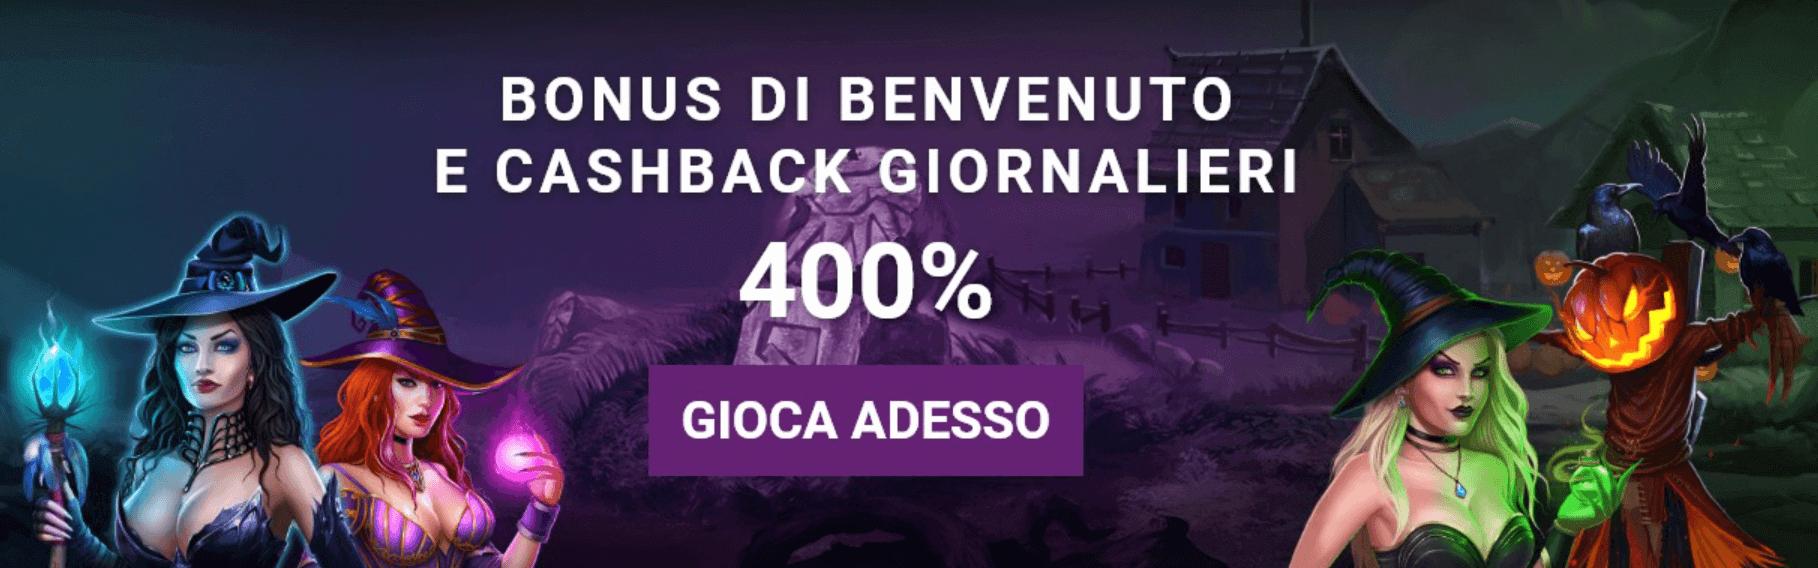 Black Magic Bonus Benvenuto